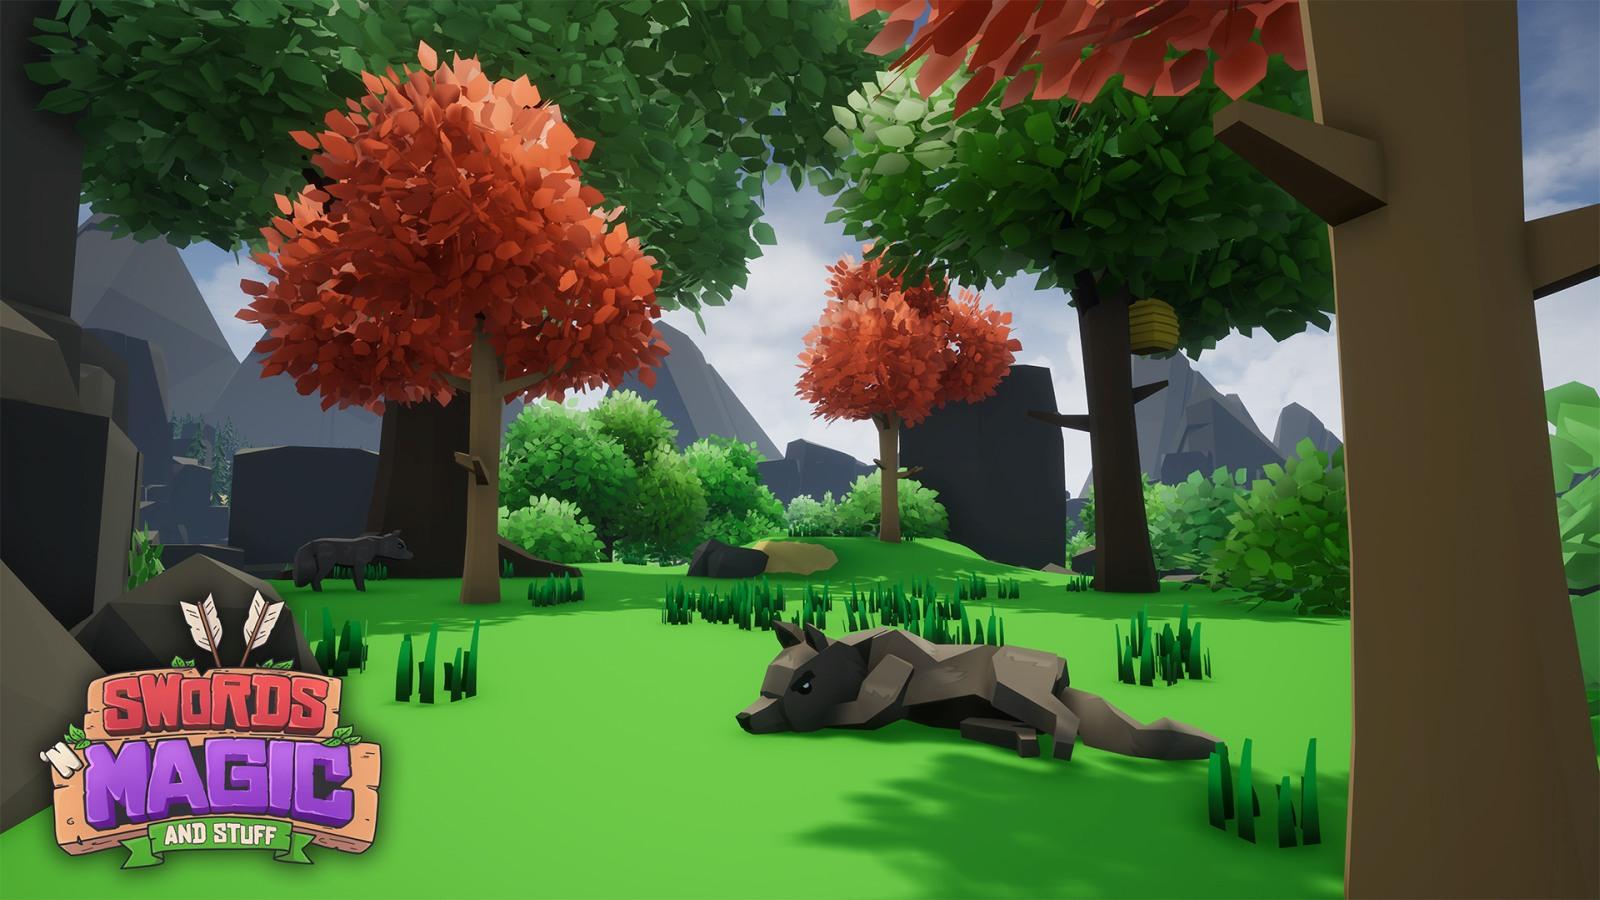 Swords 'n Magic and Stuff - Doggo | Kindred Games